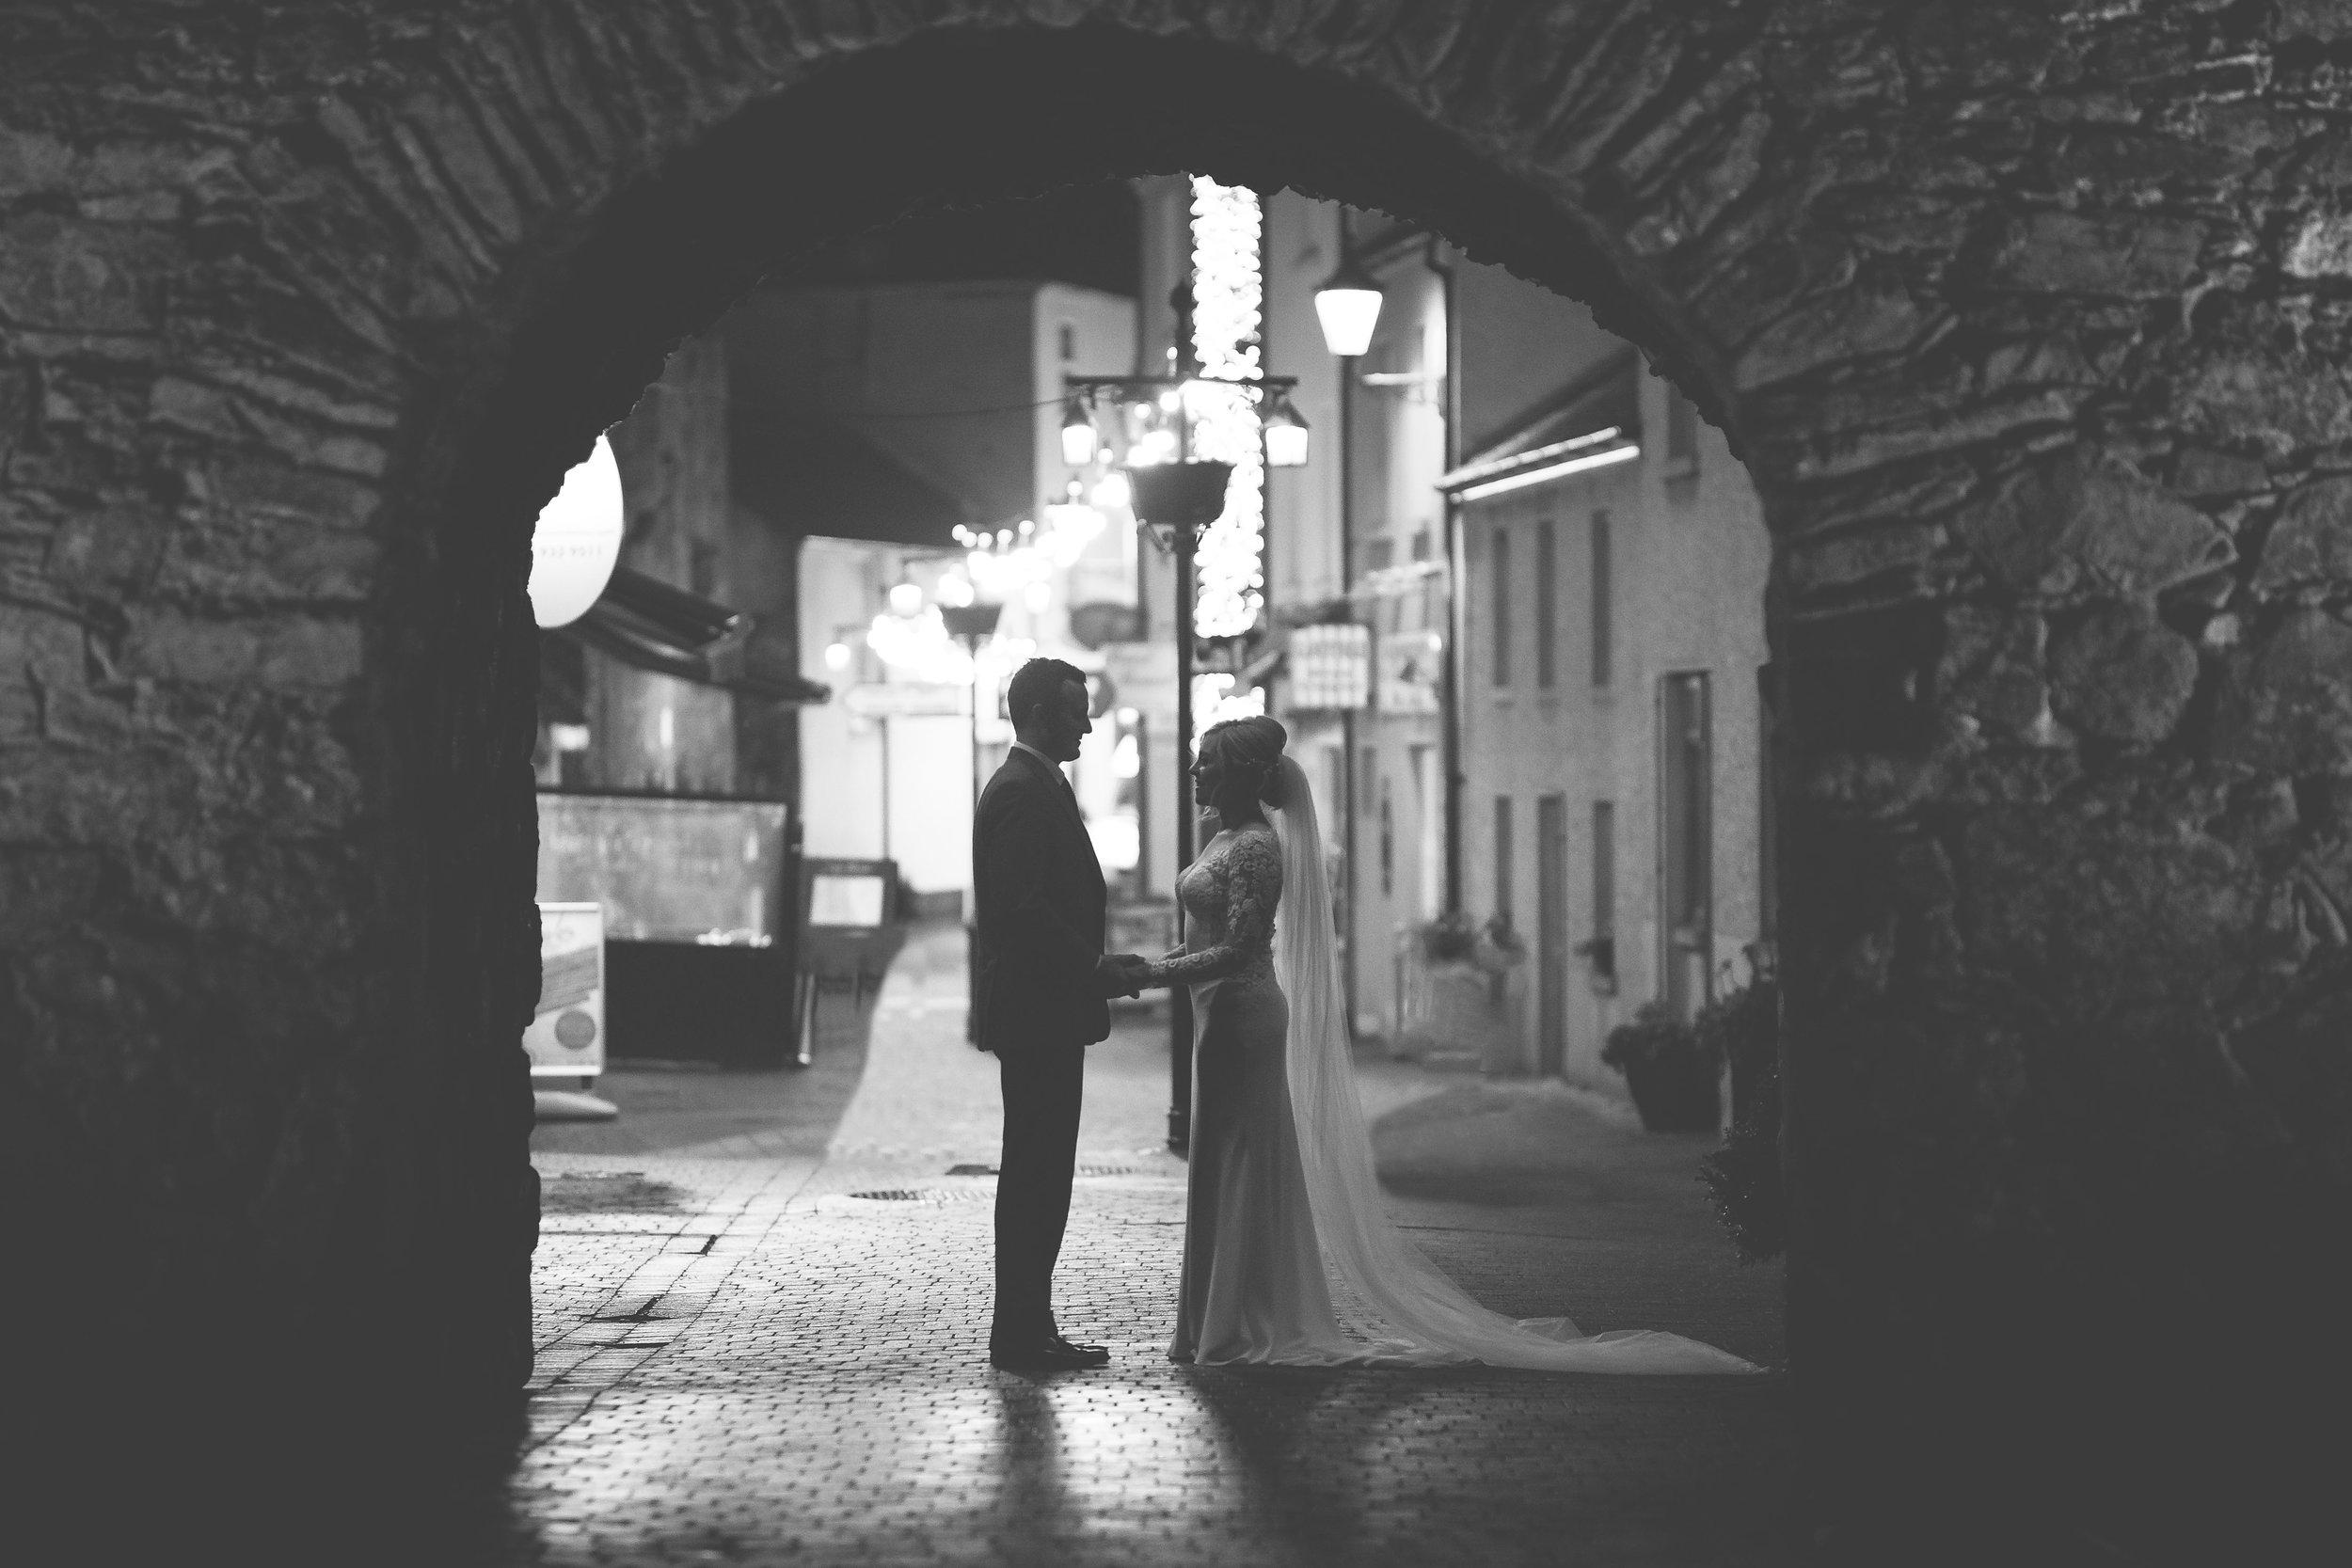 Northern Ireland Wedding Photographer   Brian McEwan Photography   Affordable Wedding Photography Throughout Antrim Down Armagh Tyrone Londonderry Derry Down Fermanagh -75.jpg